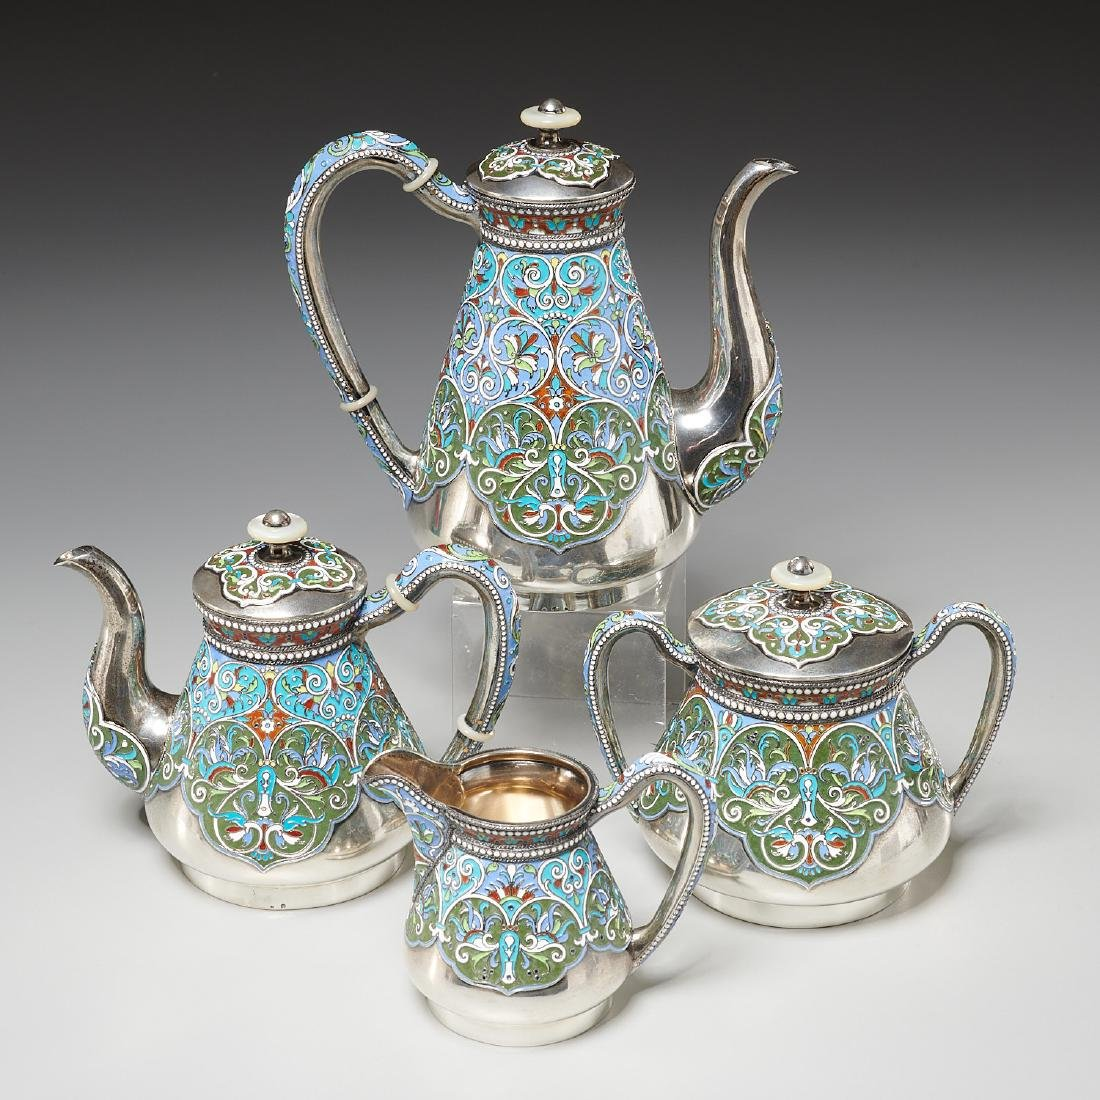 Vasily Agafonov enameled silver coffee service